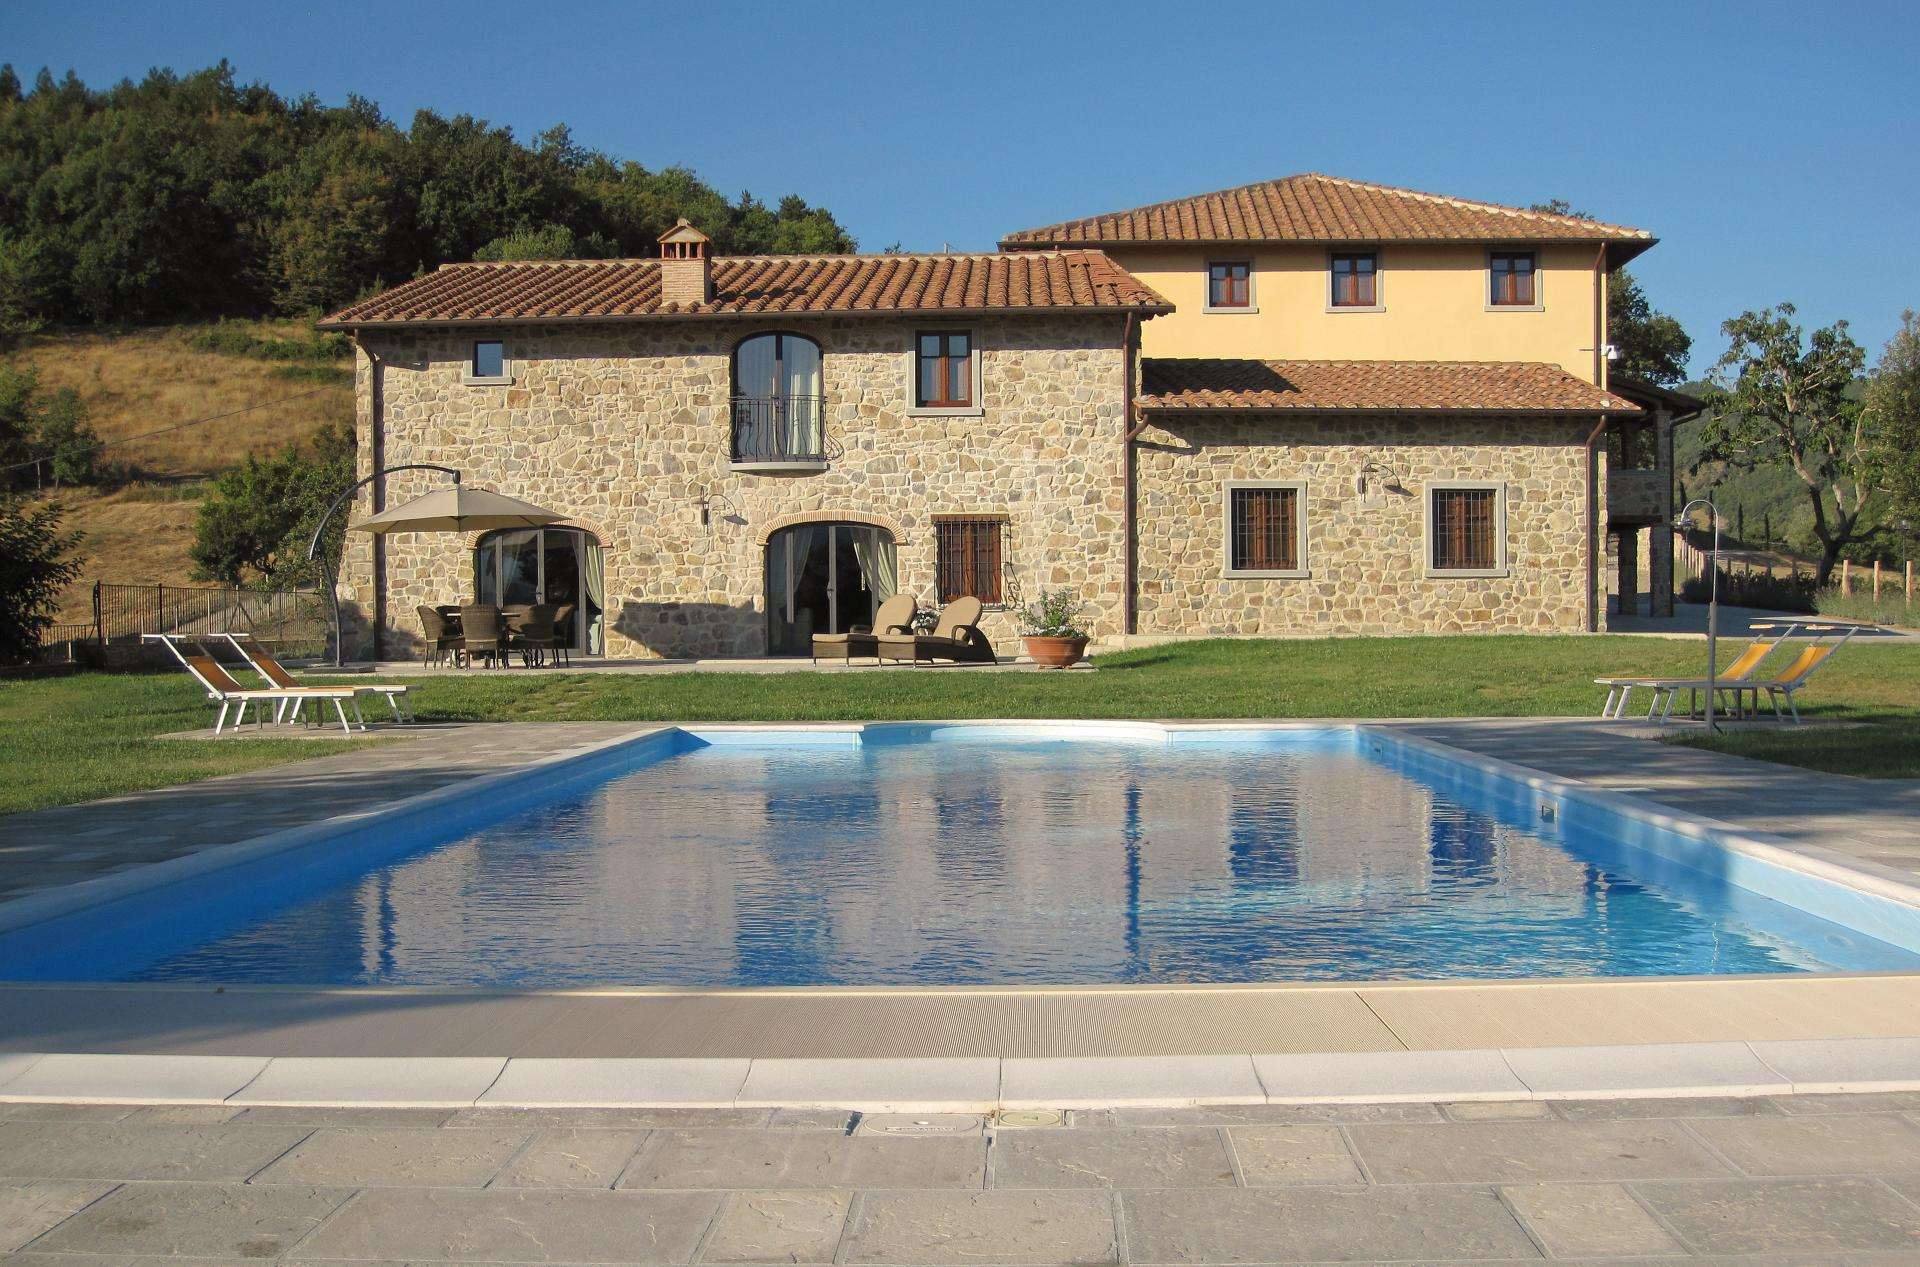 Outdoor Pool 2, Il Casentino, Poppi, Tuscany.